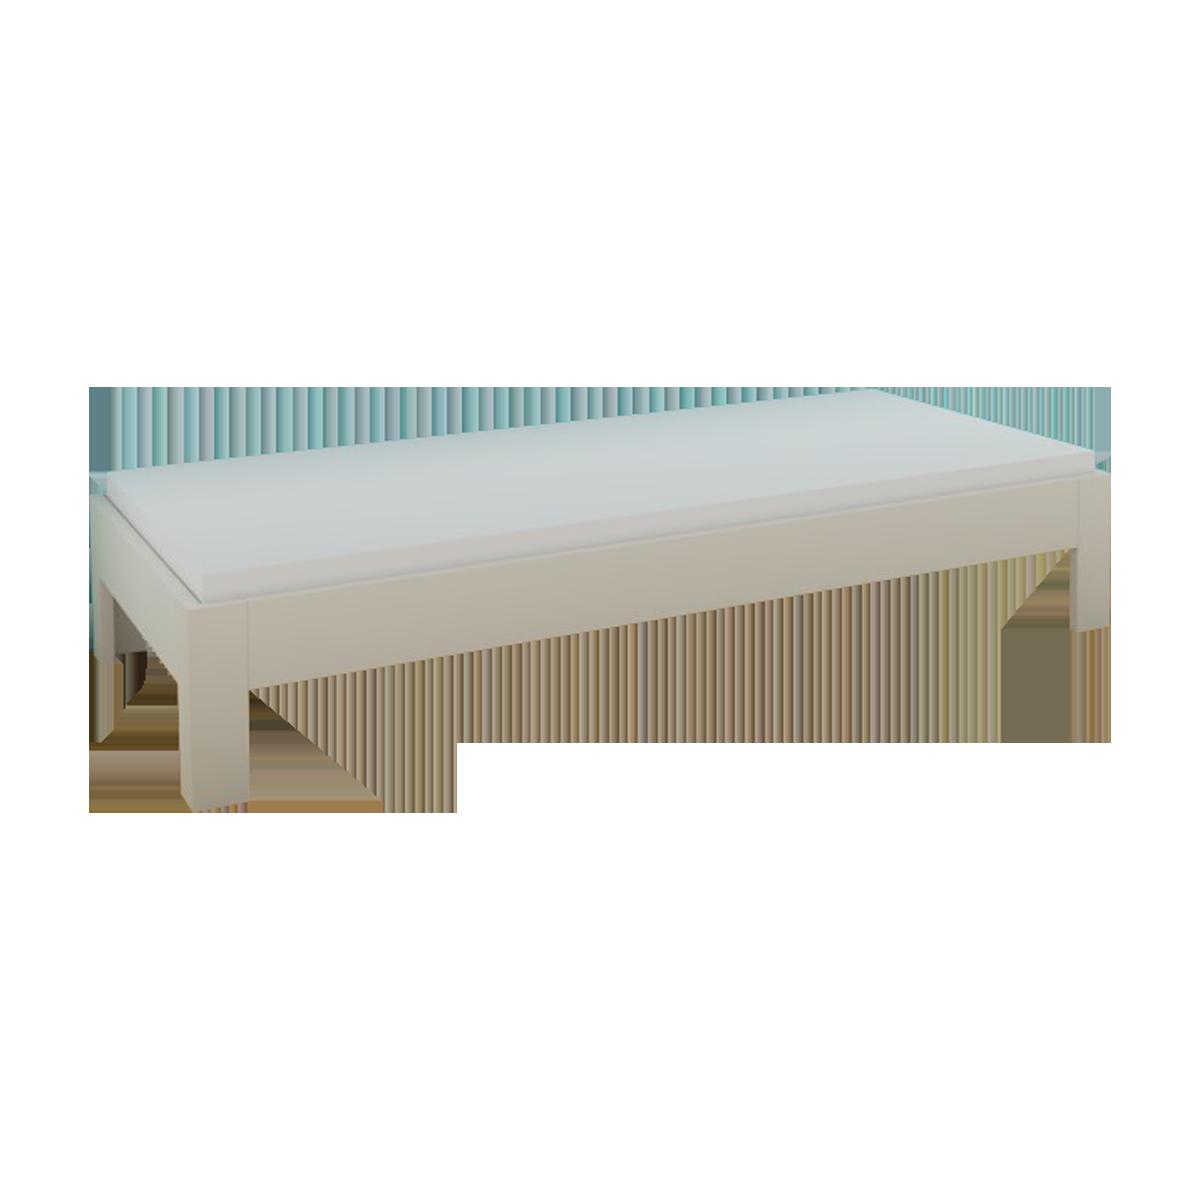 fiftytwo liege bett rudolf m bel guenstiger kaufen bei. Black Bedroom Furniture Sets. Home Design Ideas